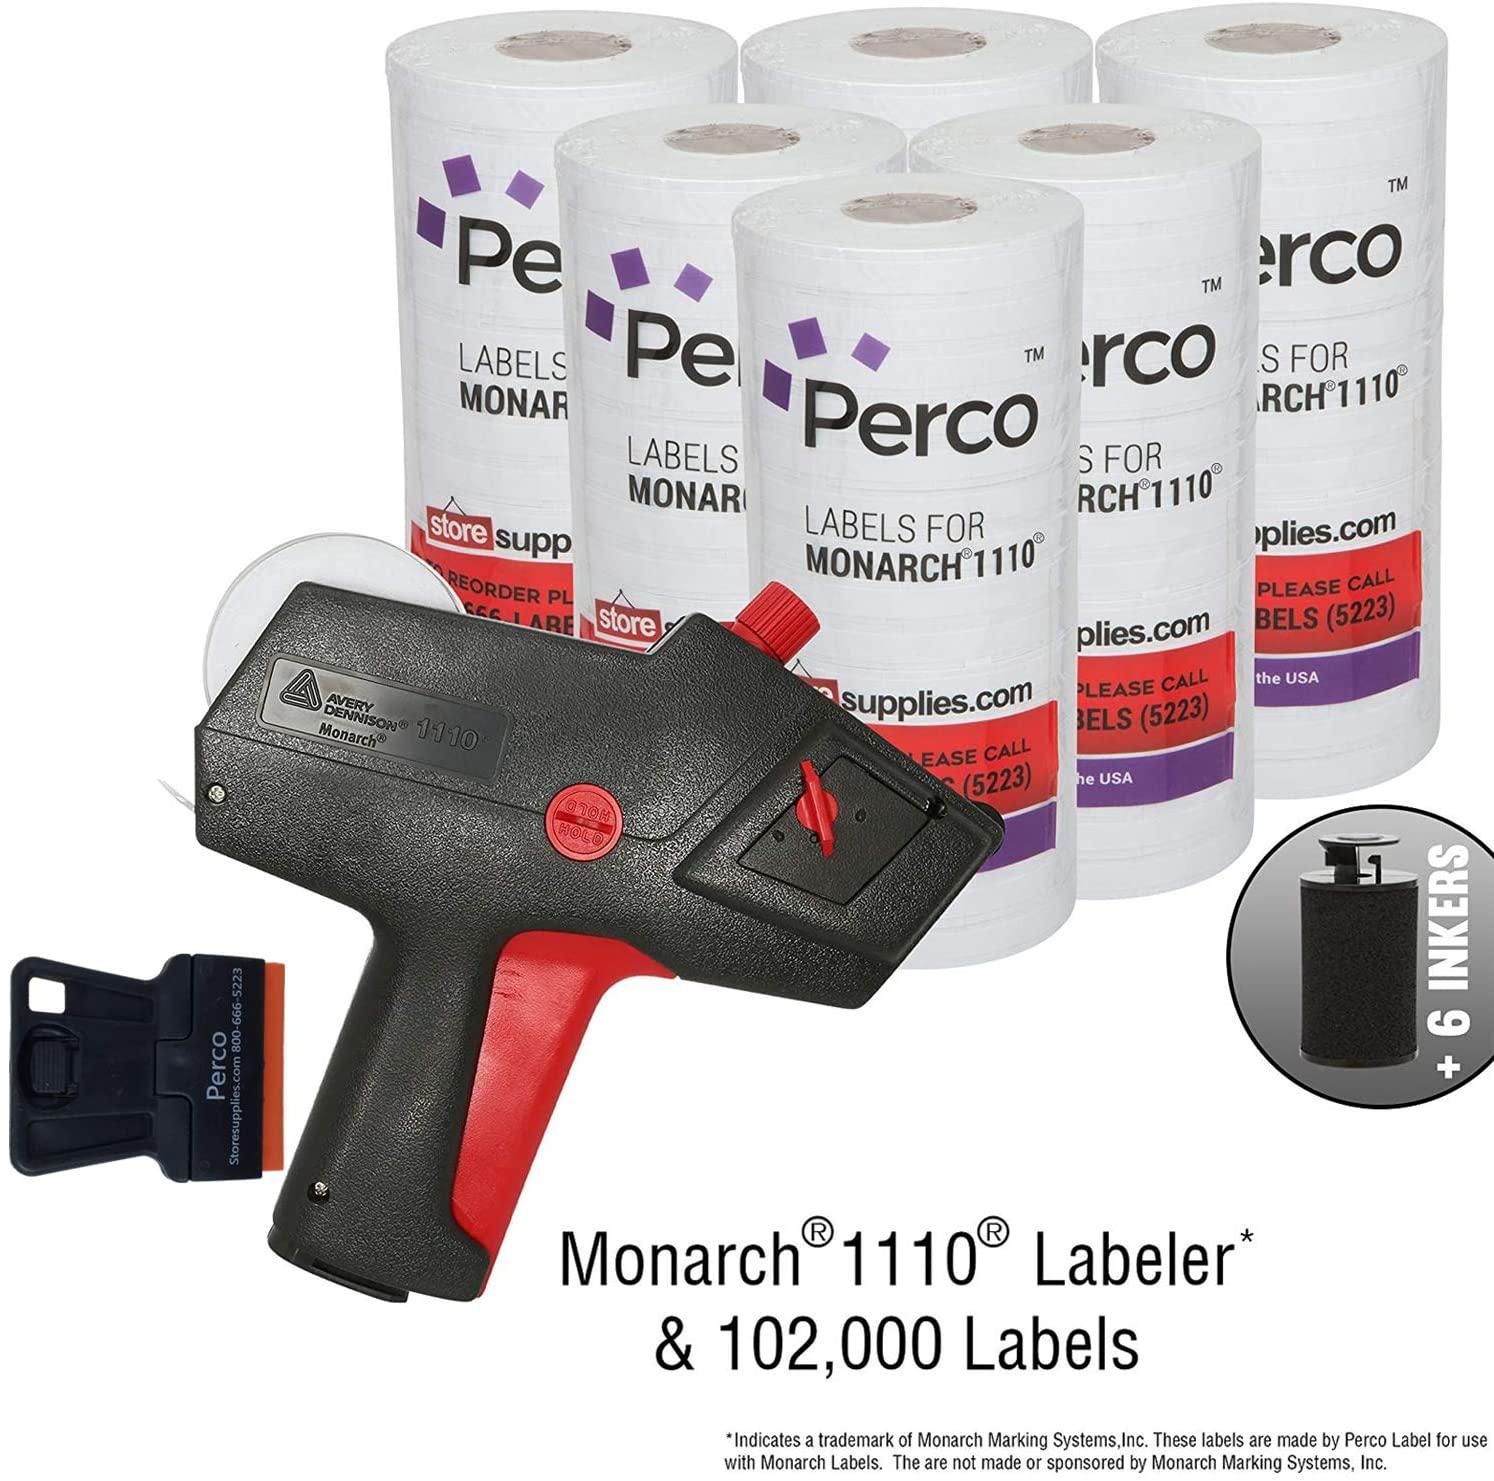 Monarch 1110 Price Gun with Labels Value Pack: Includes Monarch 1110 Pricing Gun, 102,000 White Pricemarking Labels, Bonus Inkers